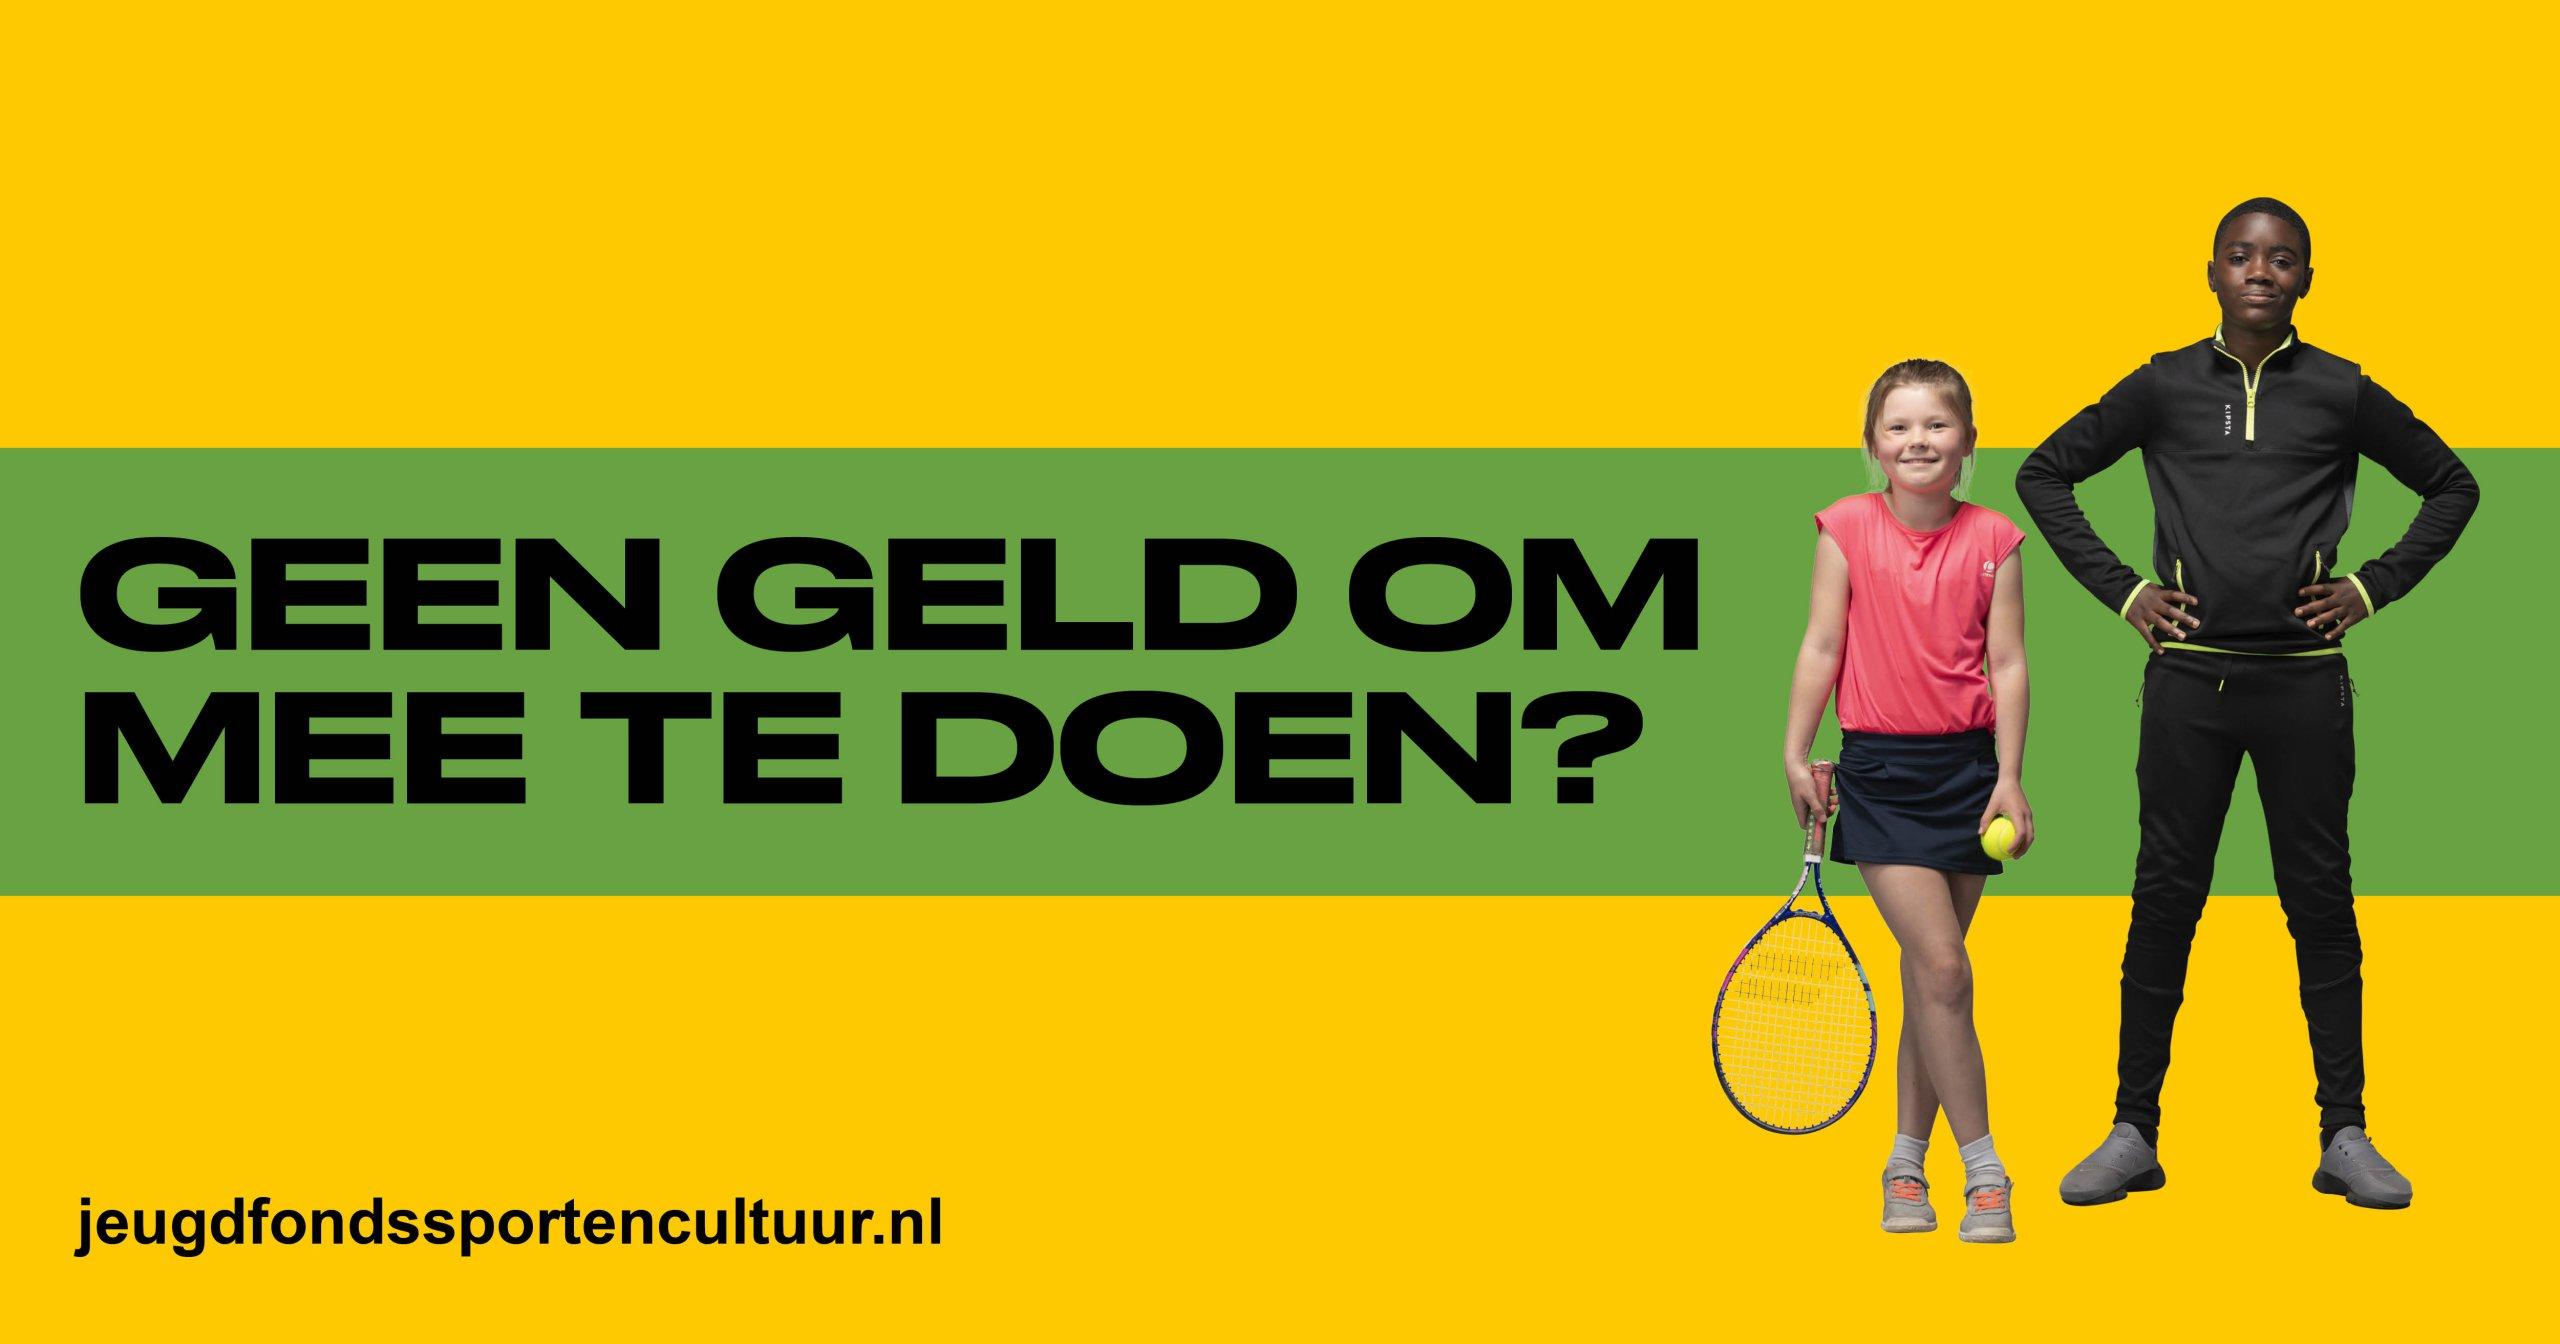 Tennis via Jeugdfonds Sport & Cultuur